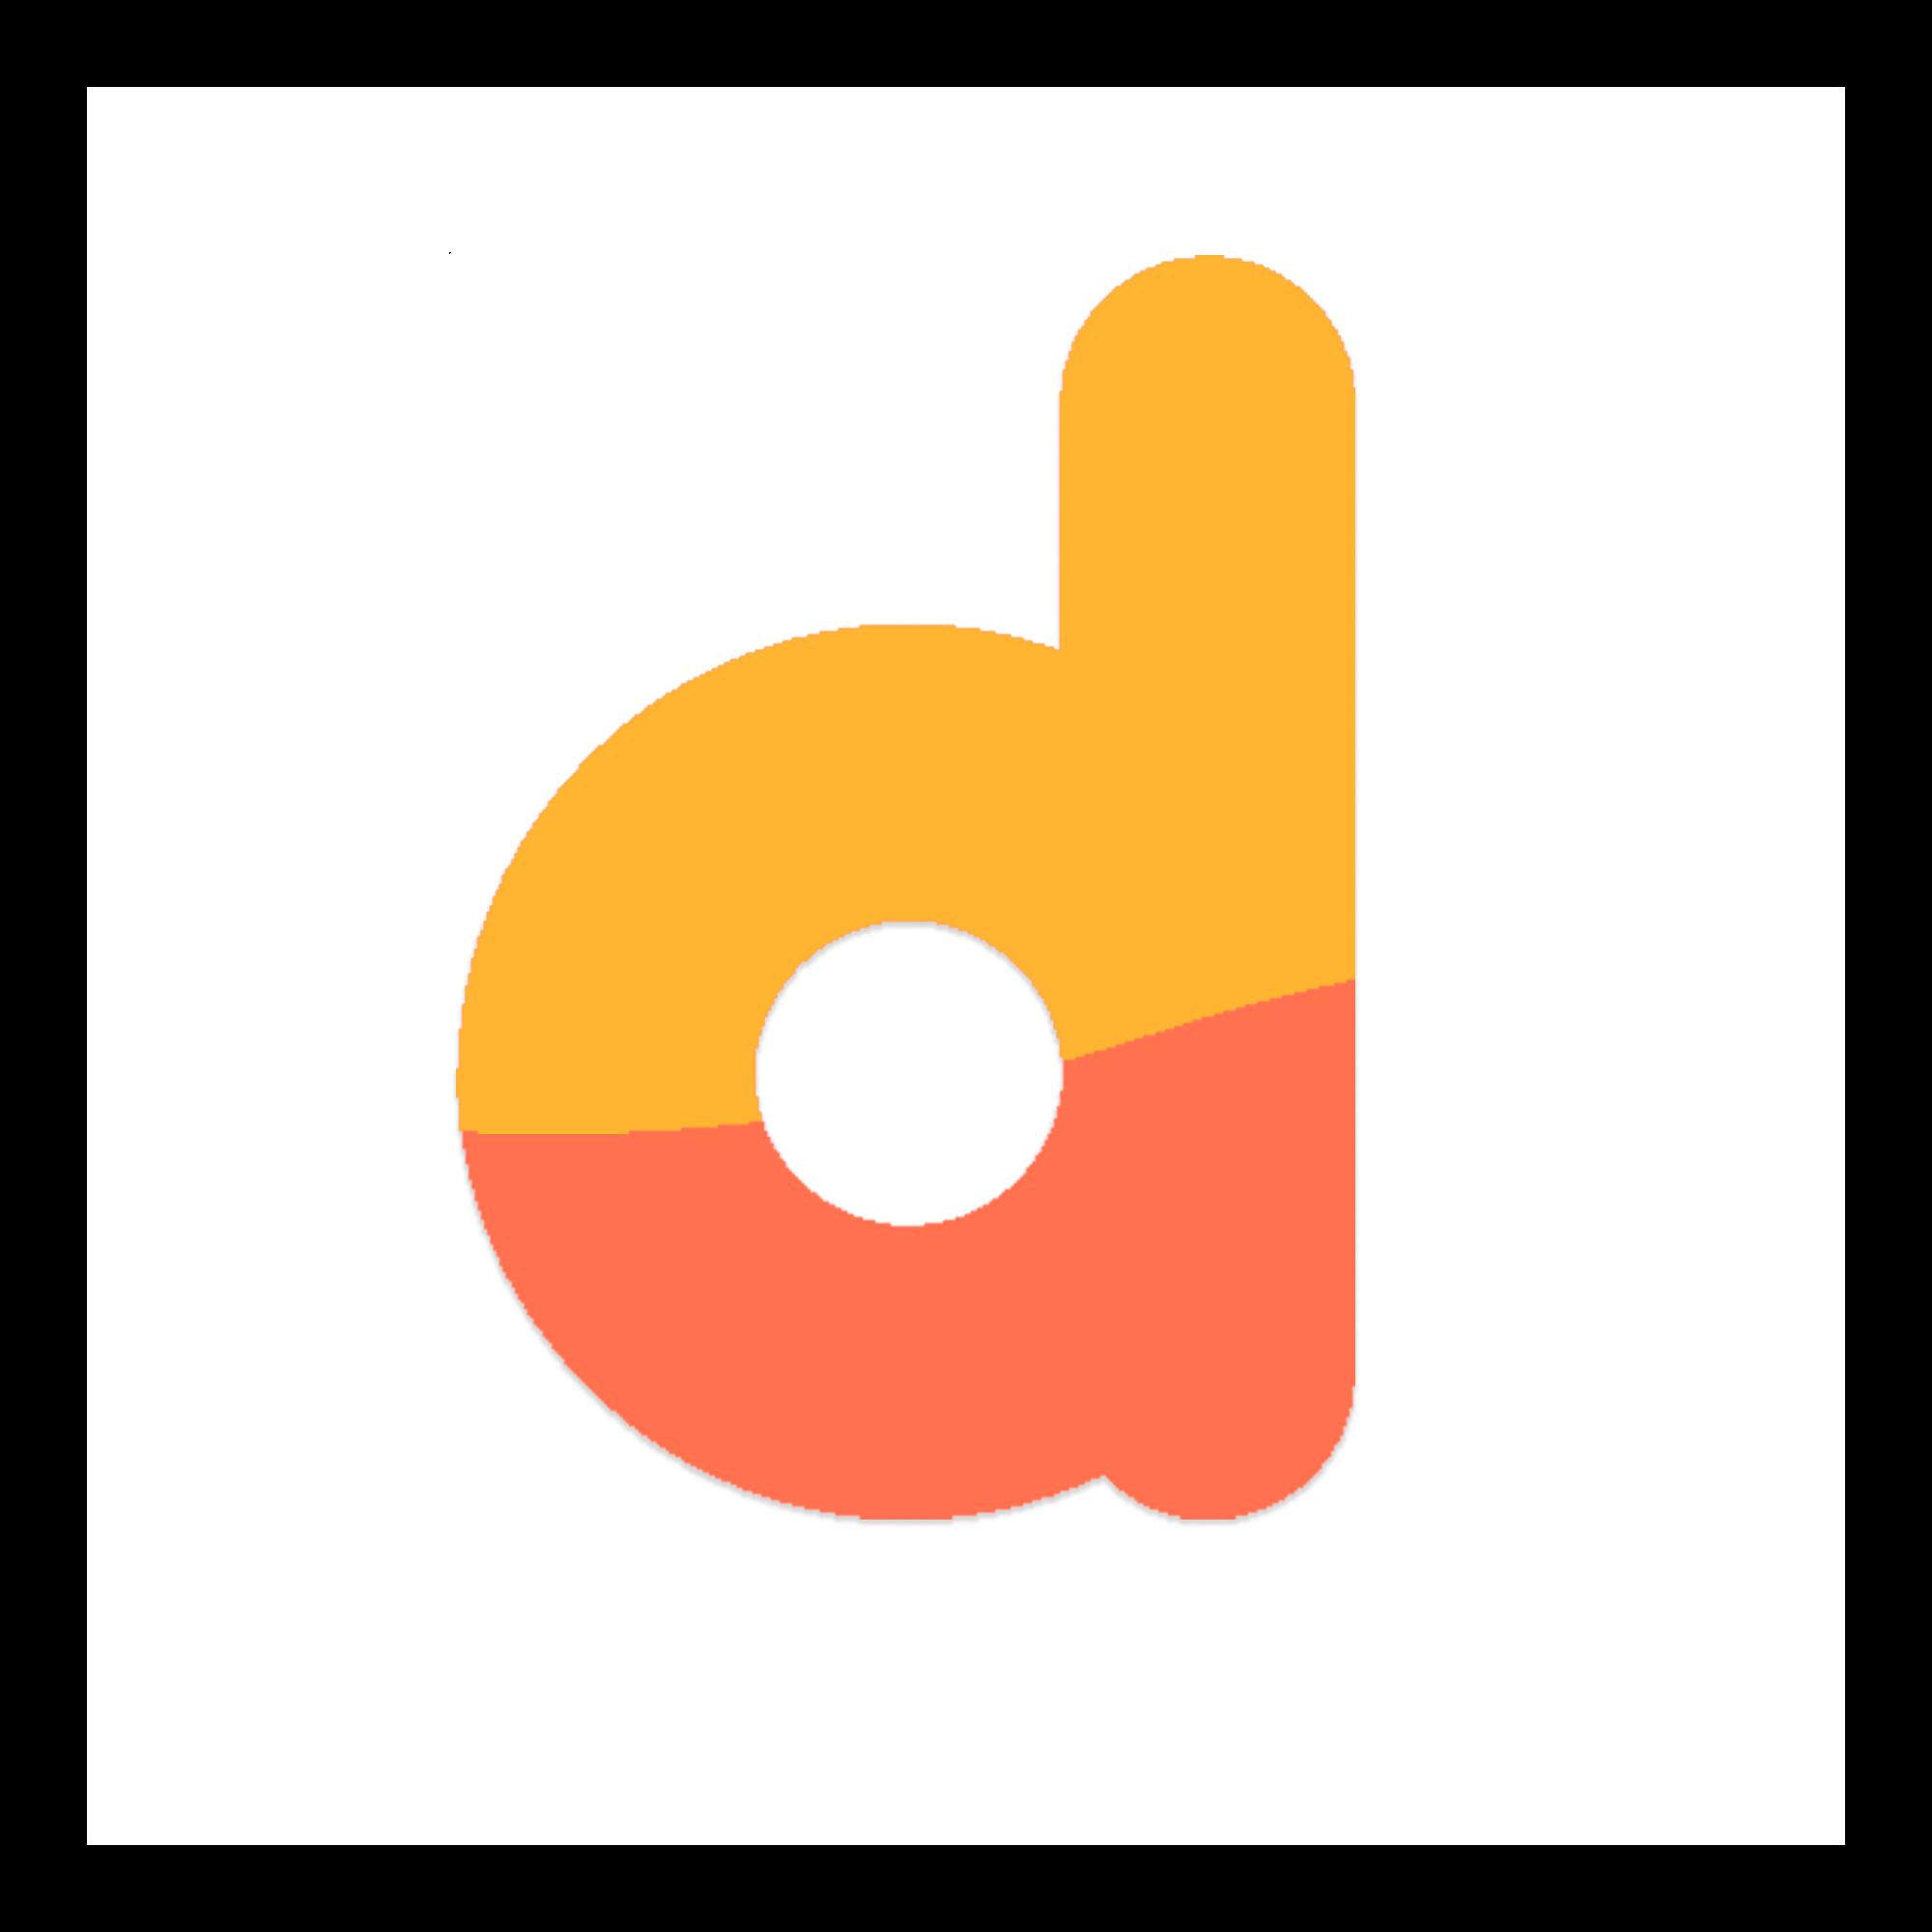 dualmedia - Isotipo